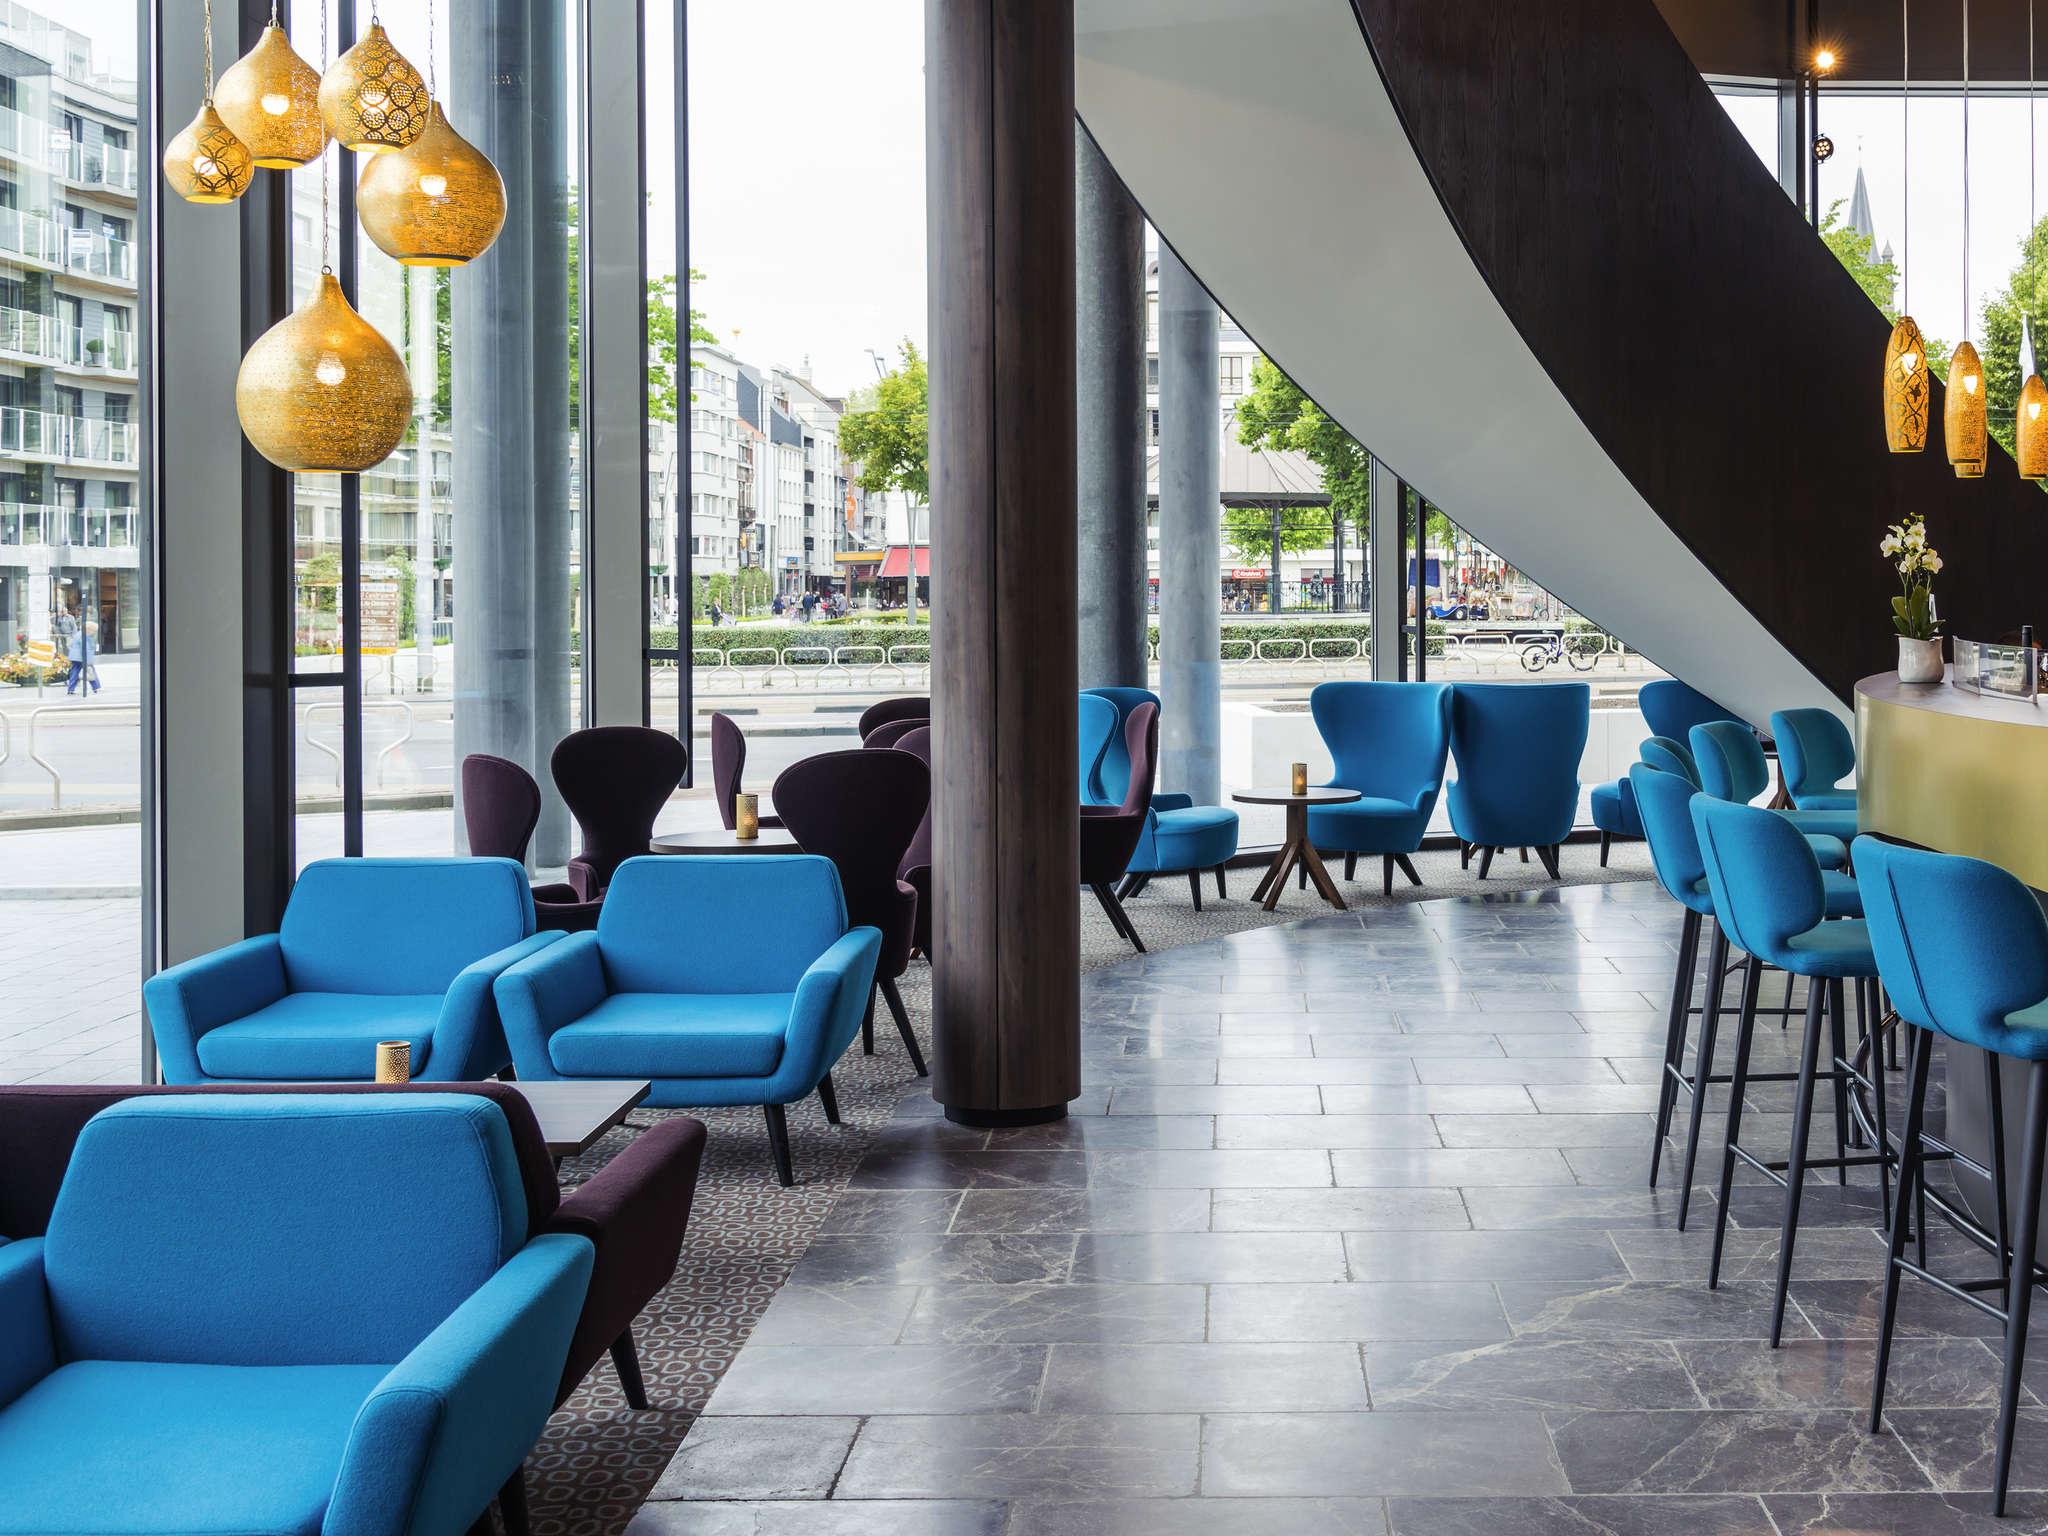 Hotel - Hotel Mercure Blankenberge Station